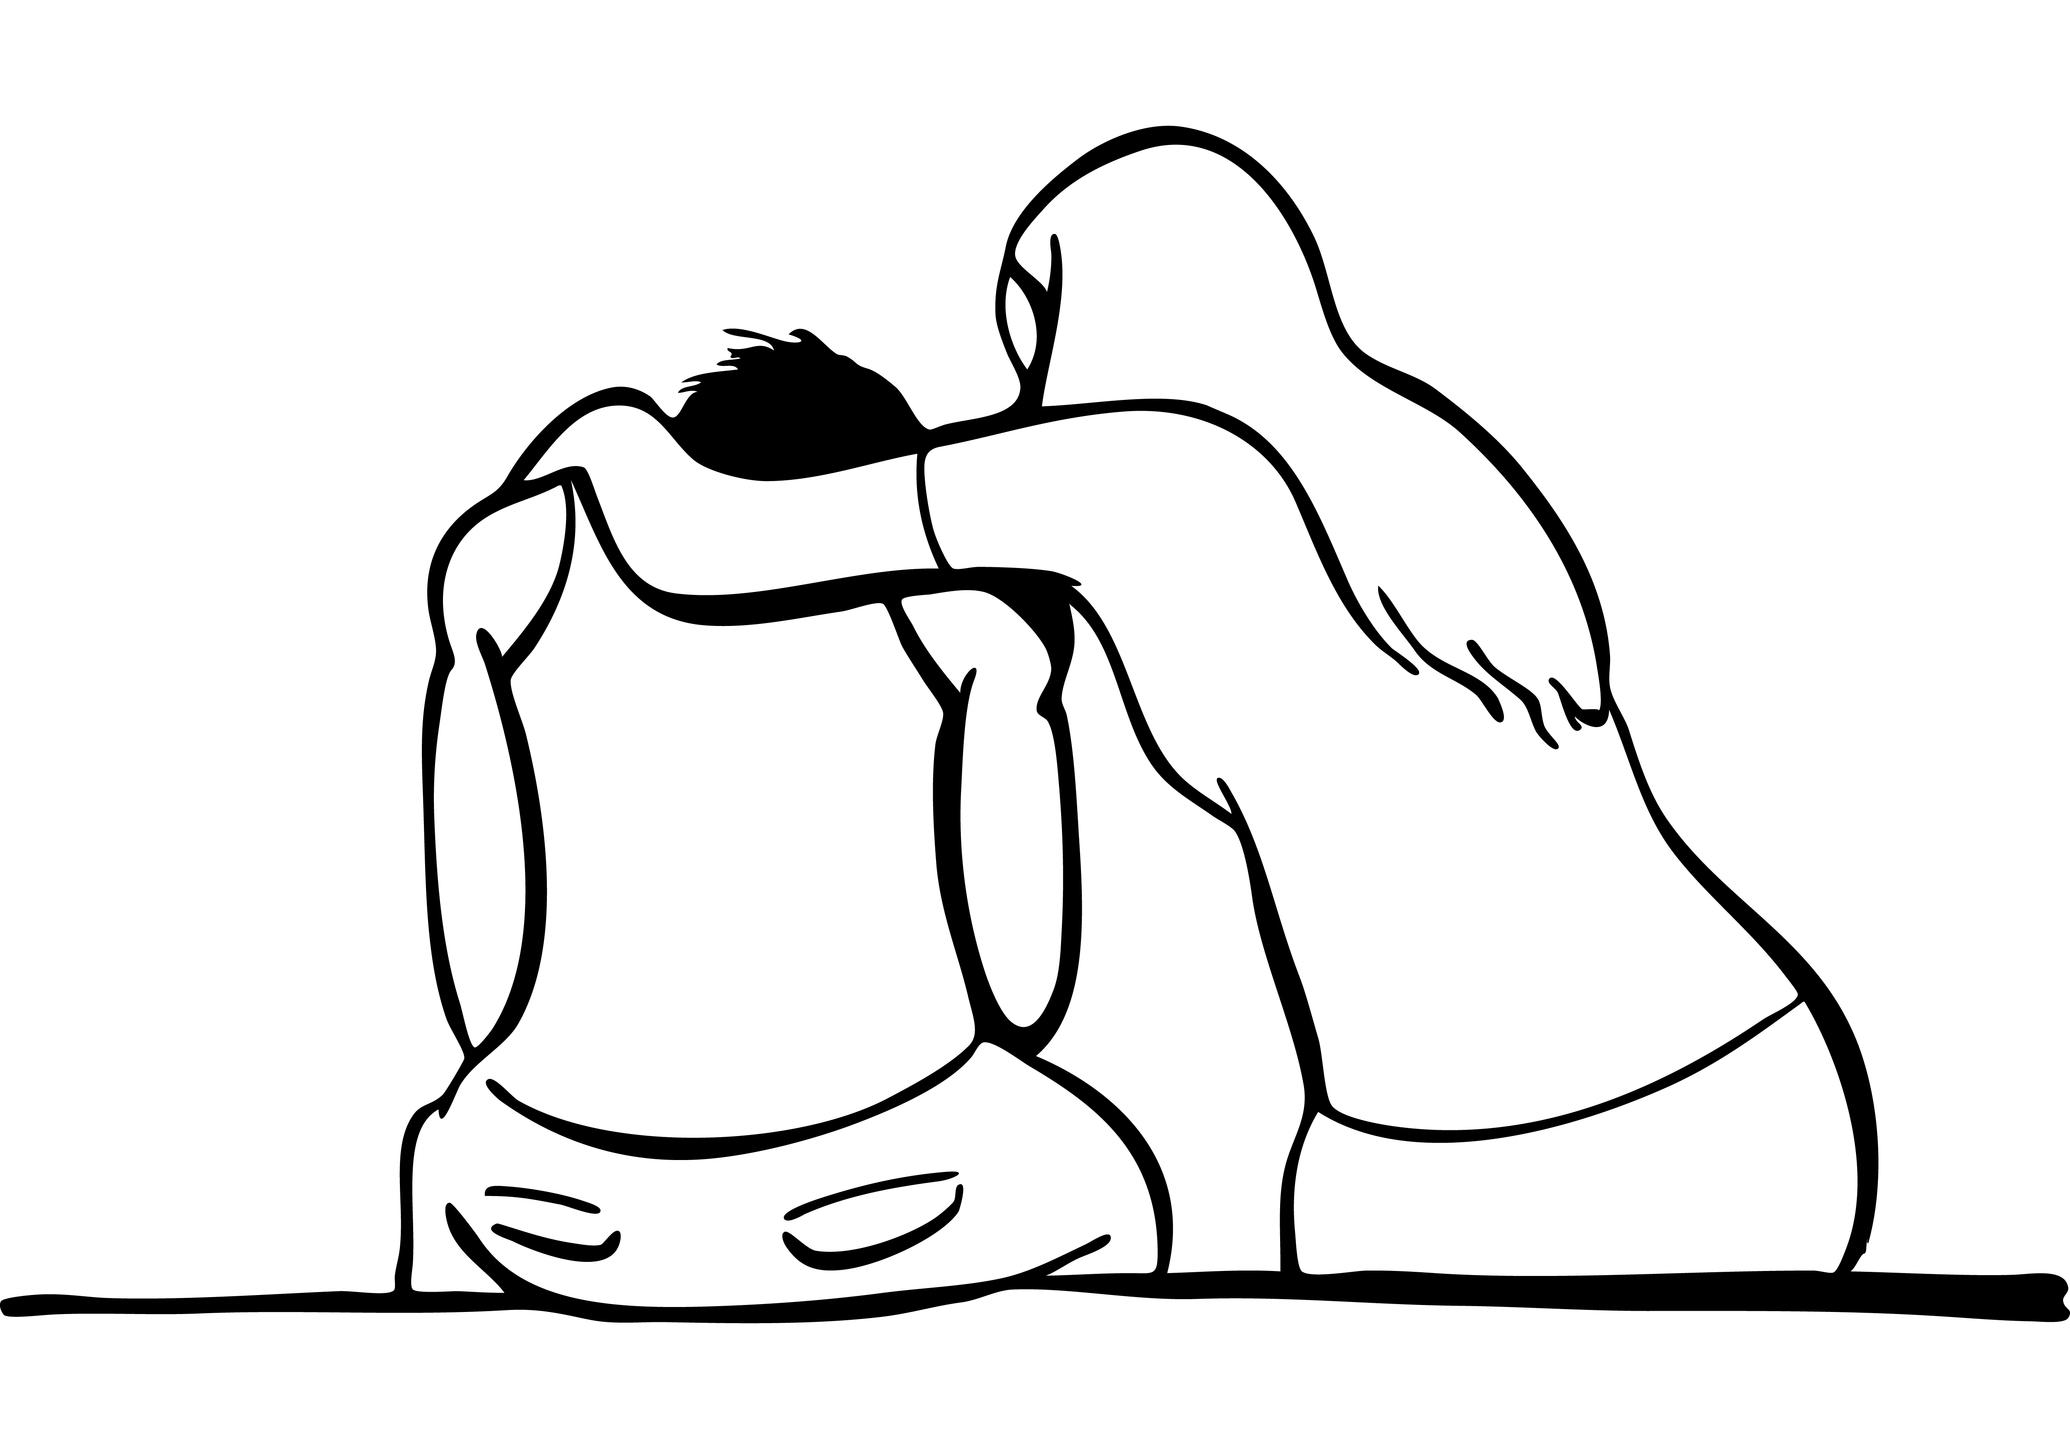 image of comforting